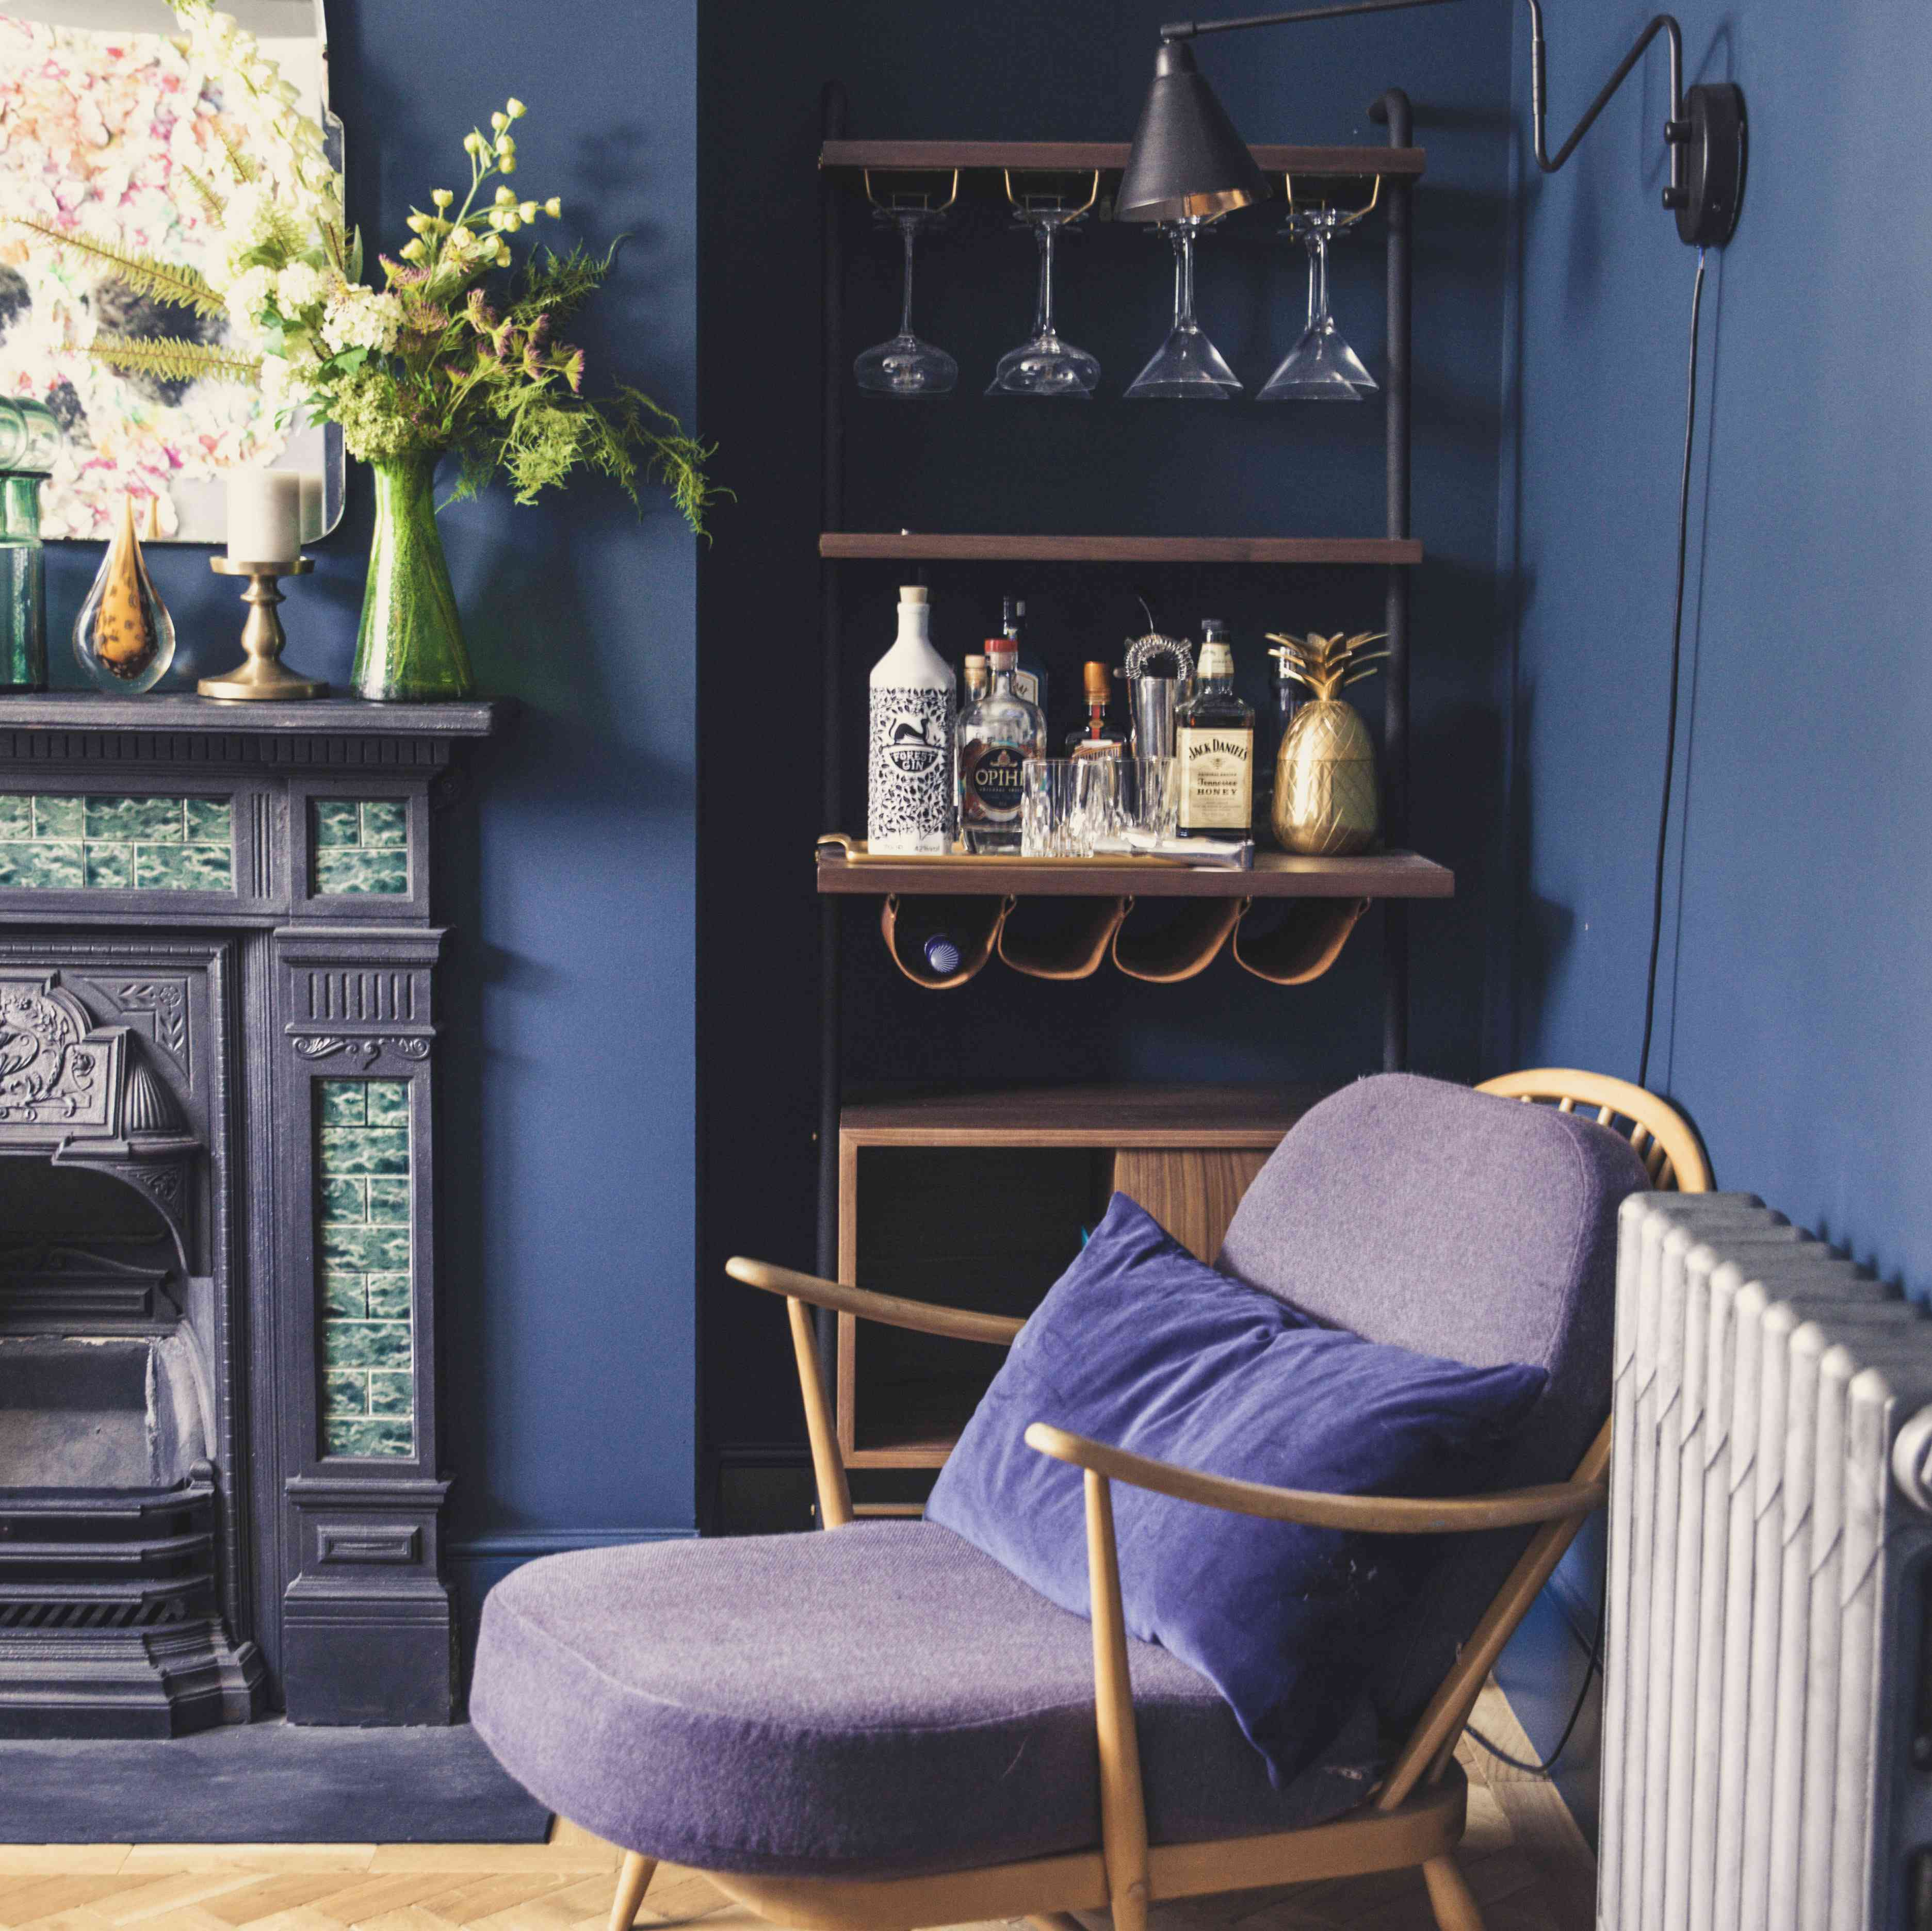 Purple armchair in a navy room.